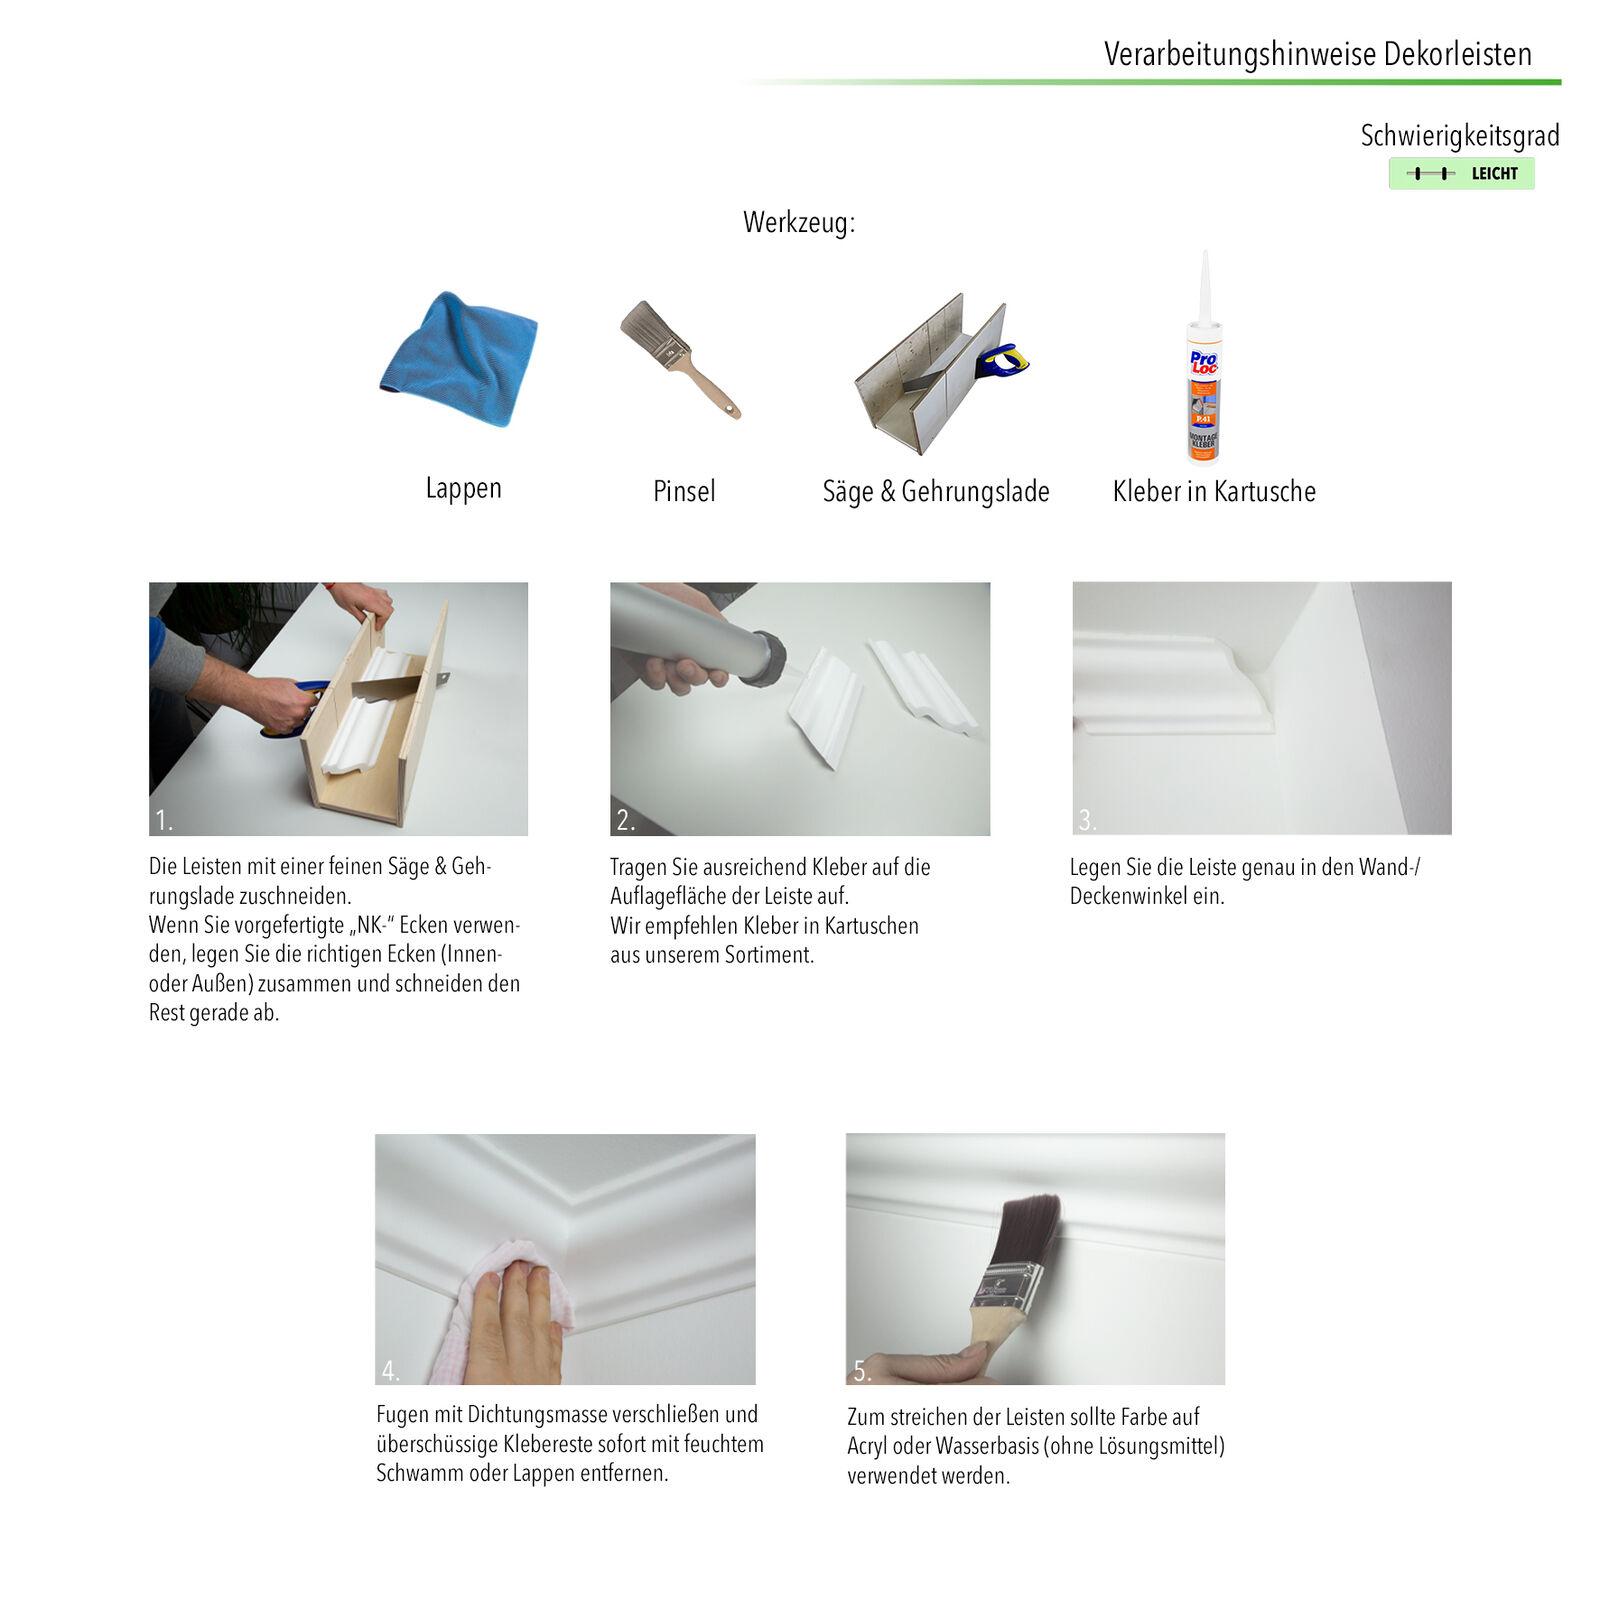 s l1600 - 20 Metros Friesprofil Guía Lisa Cenefa Poliestireno Moldura Estable 18x38mm E-18